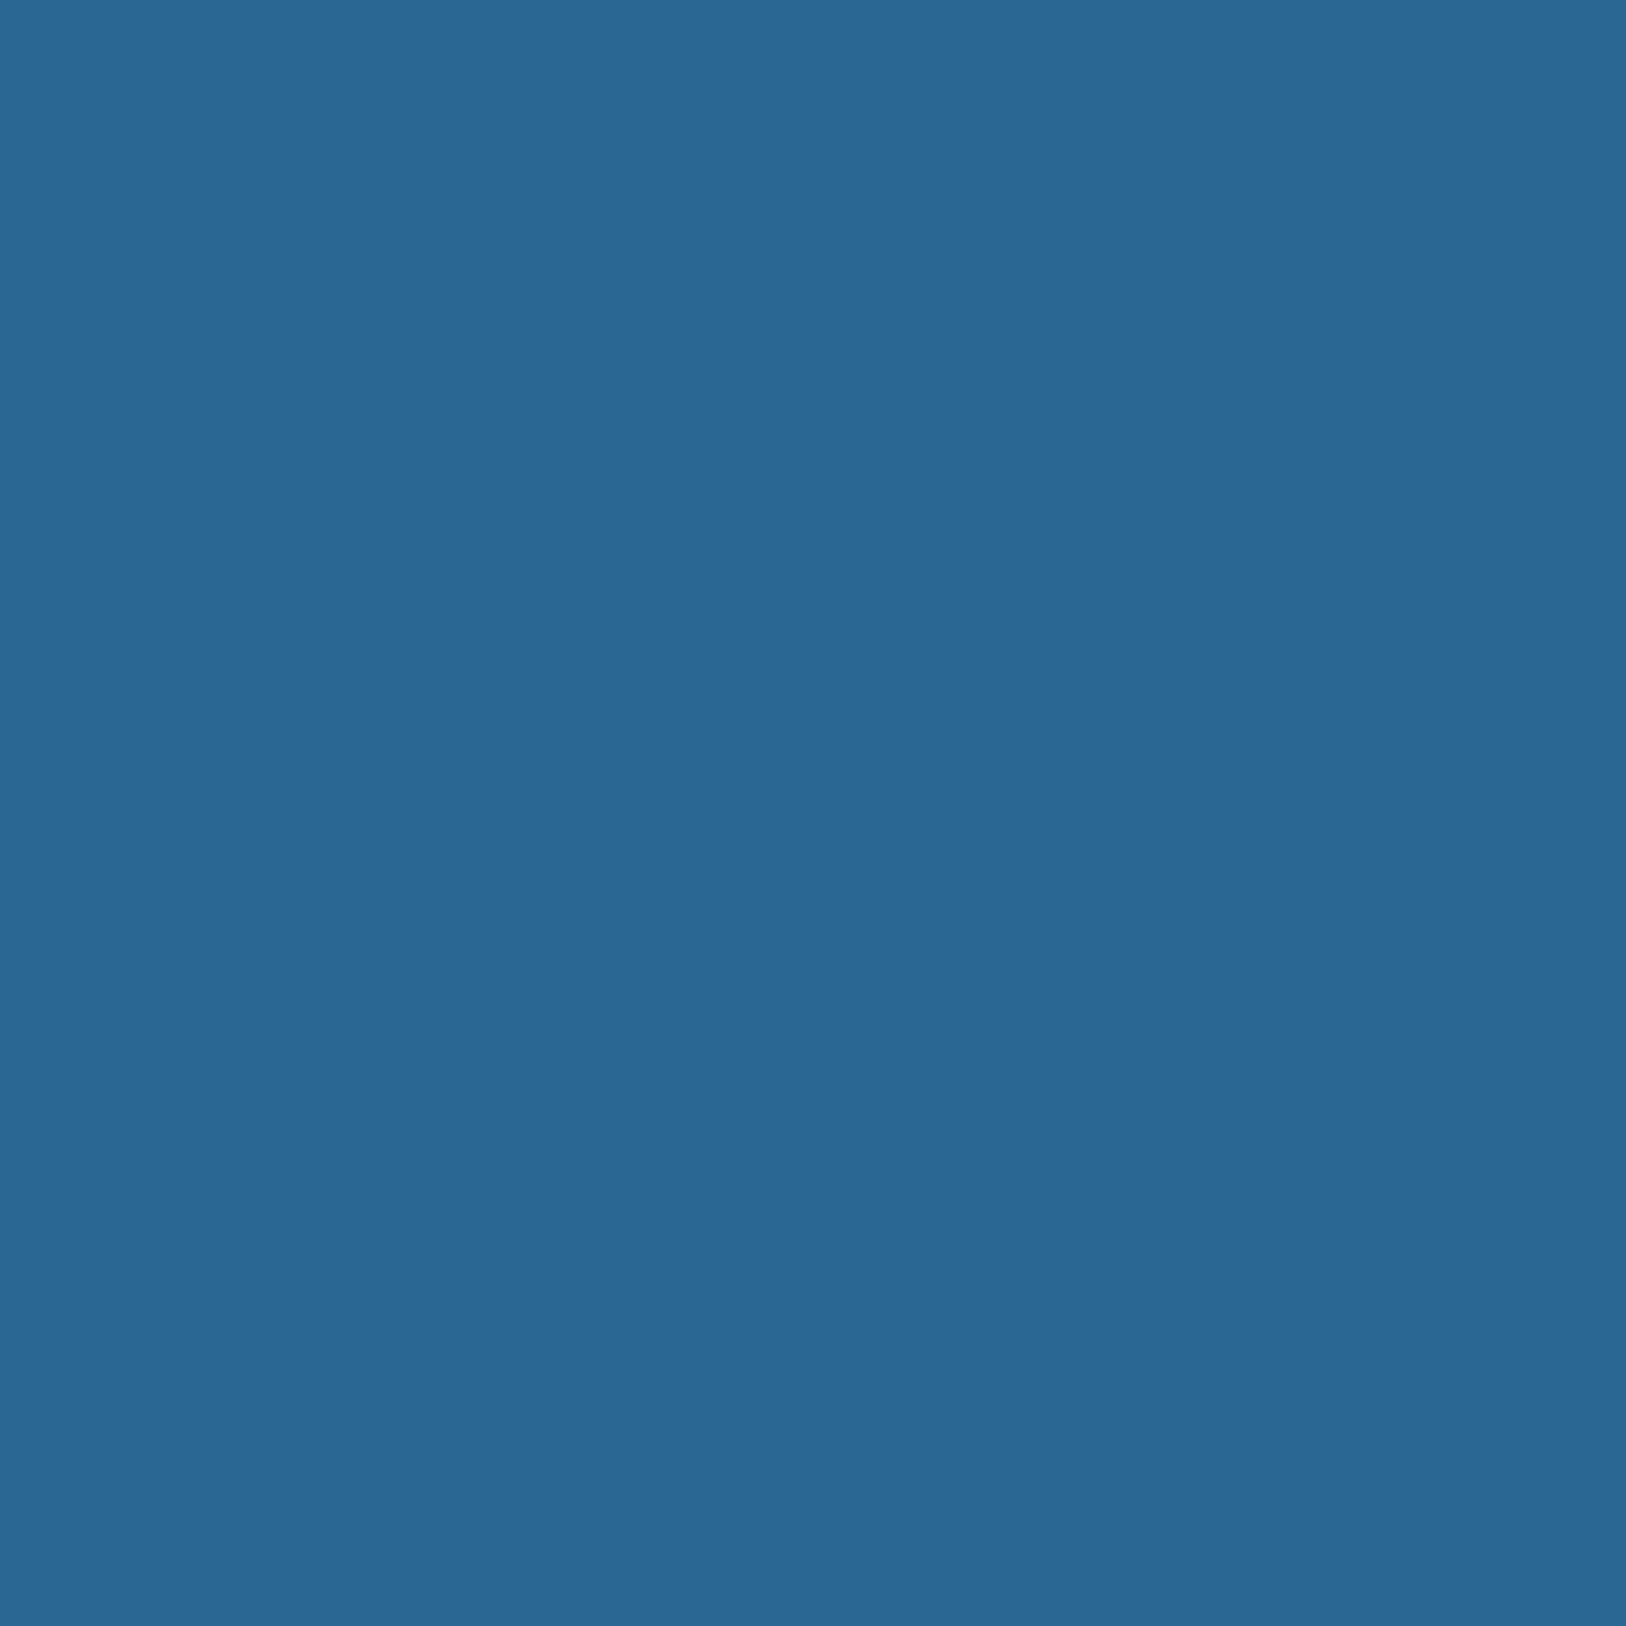 Blue Background Free Your Instinct